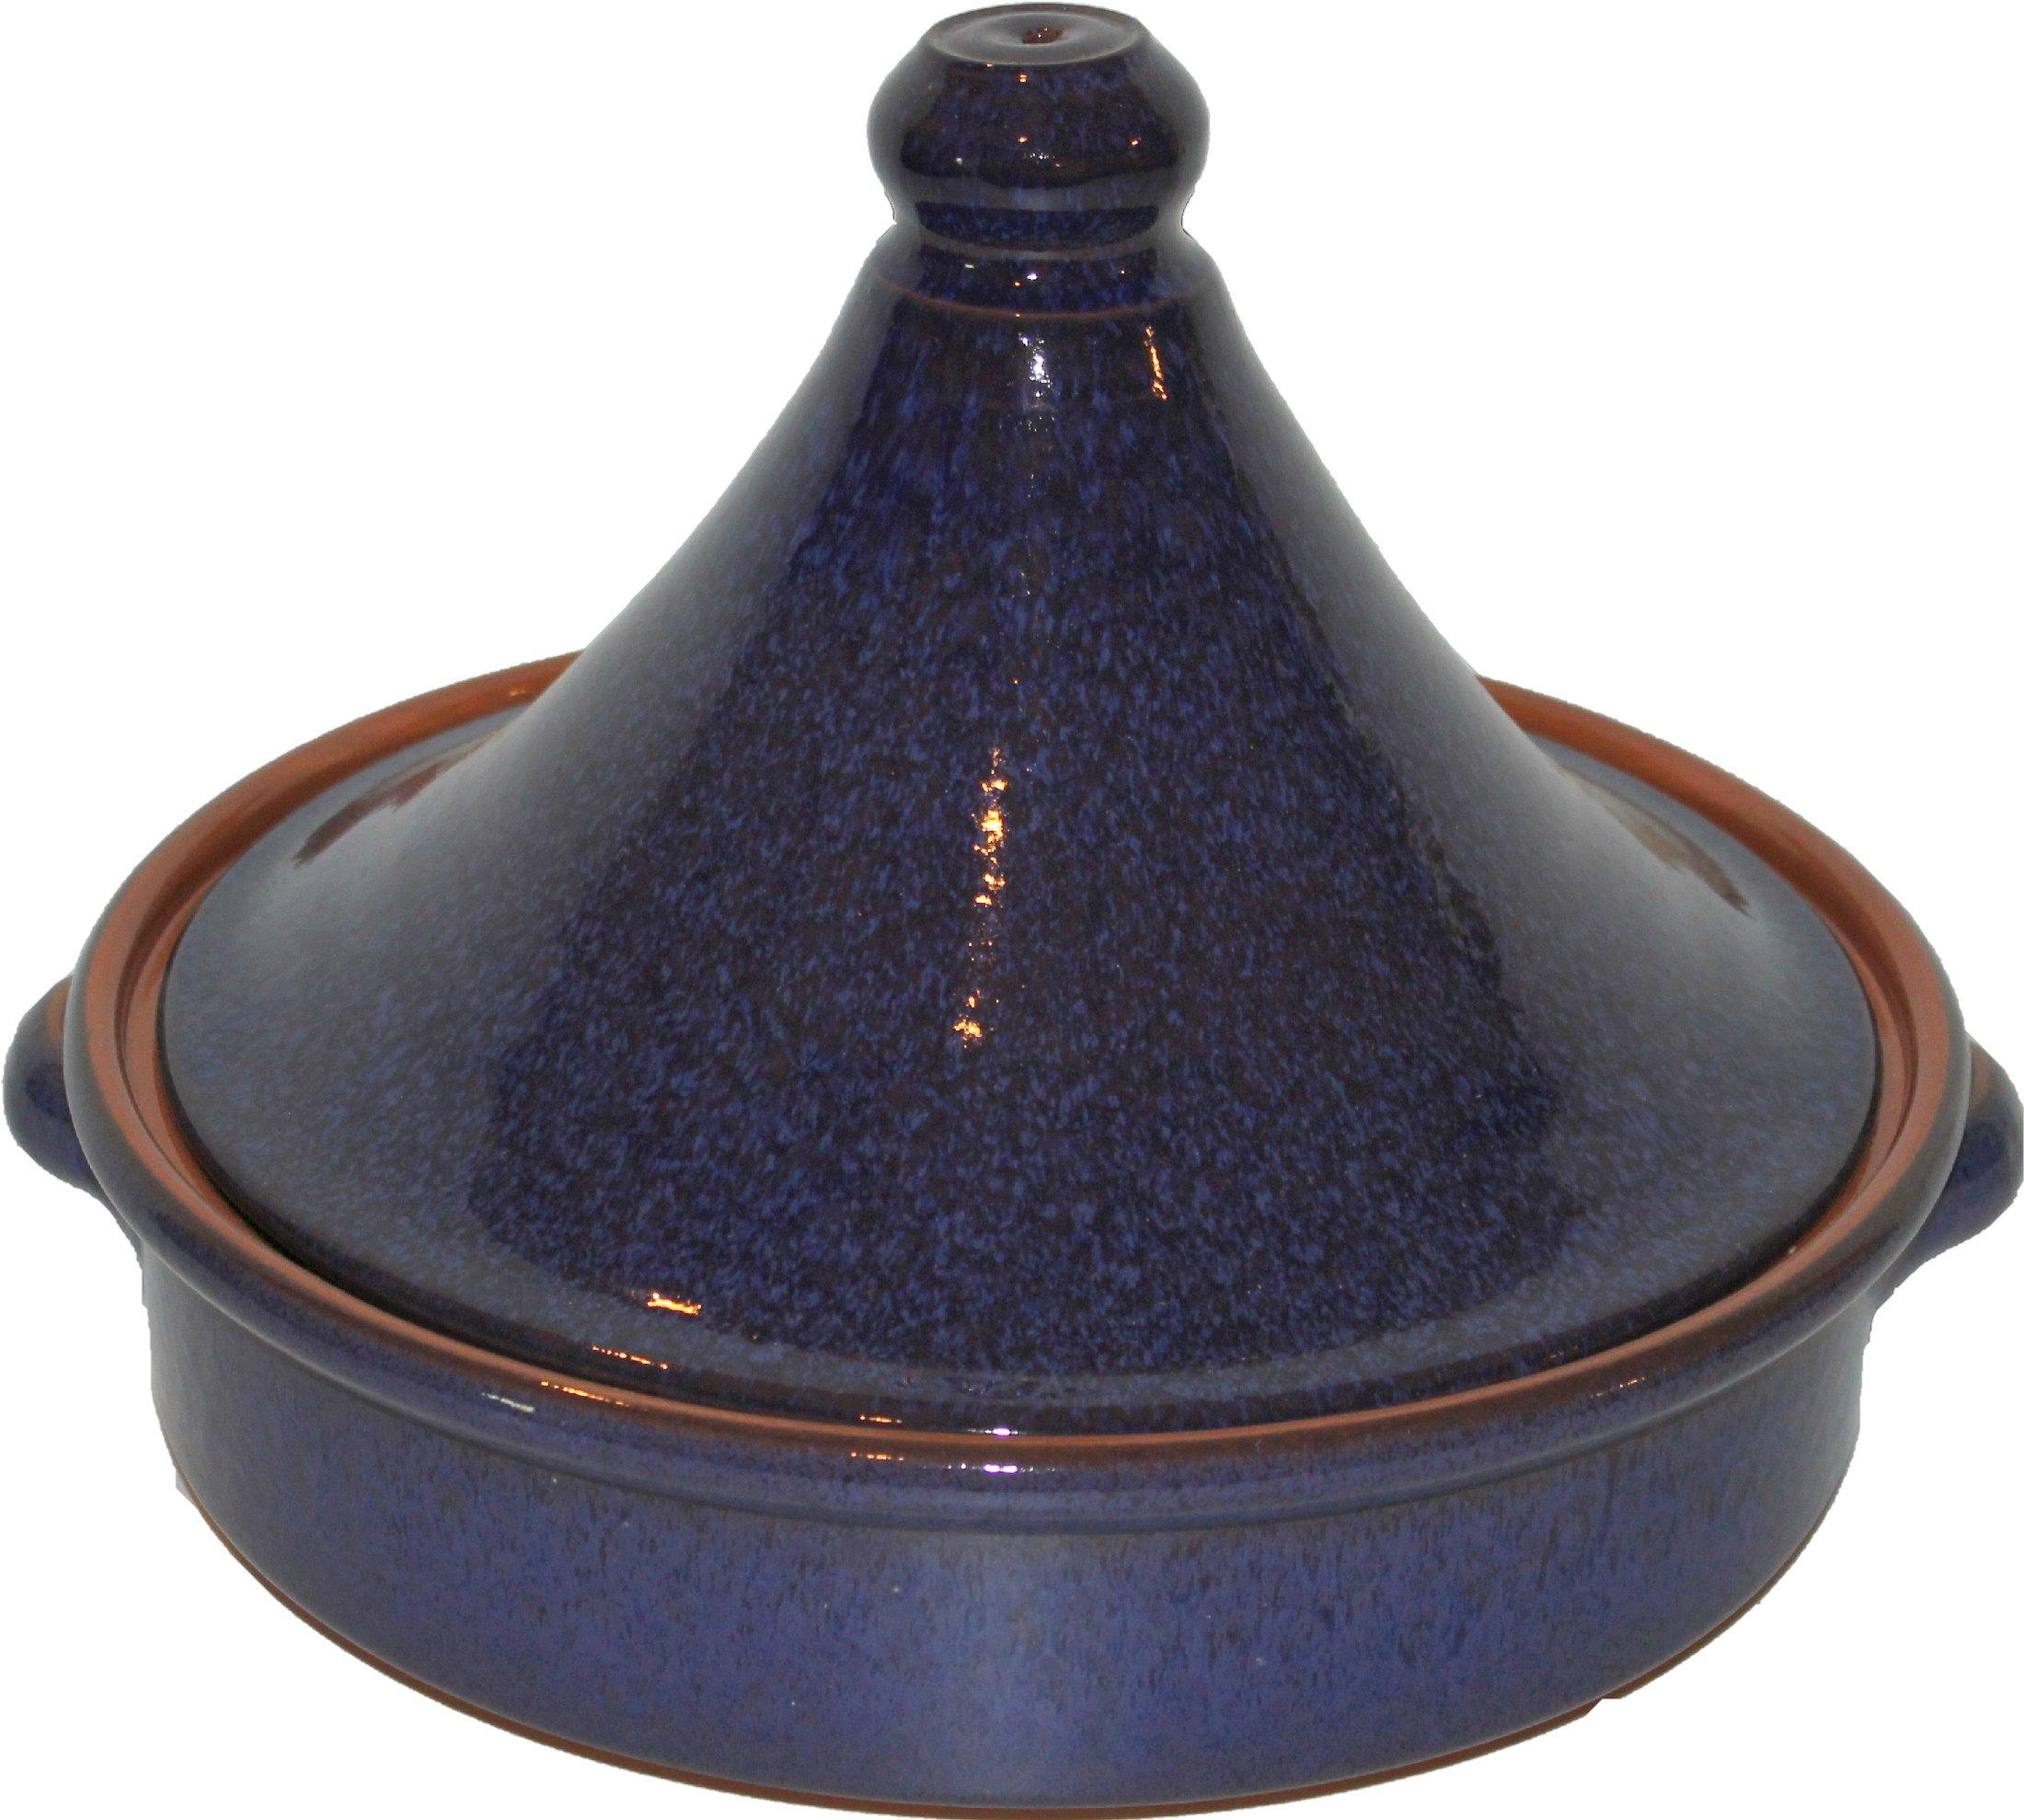 Amazing Cookware 28cm Terracotta Tagine - 'Reactive Blue' by Amazing Cookware by Amazing Cookware